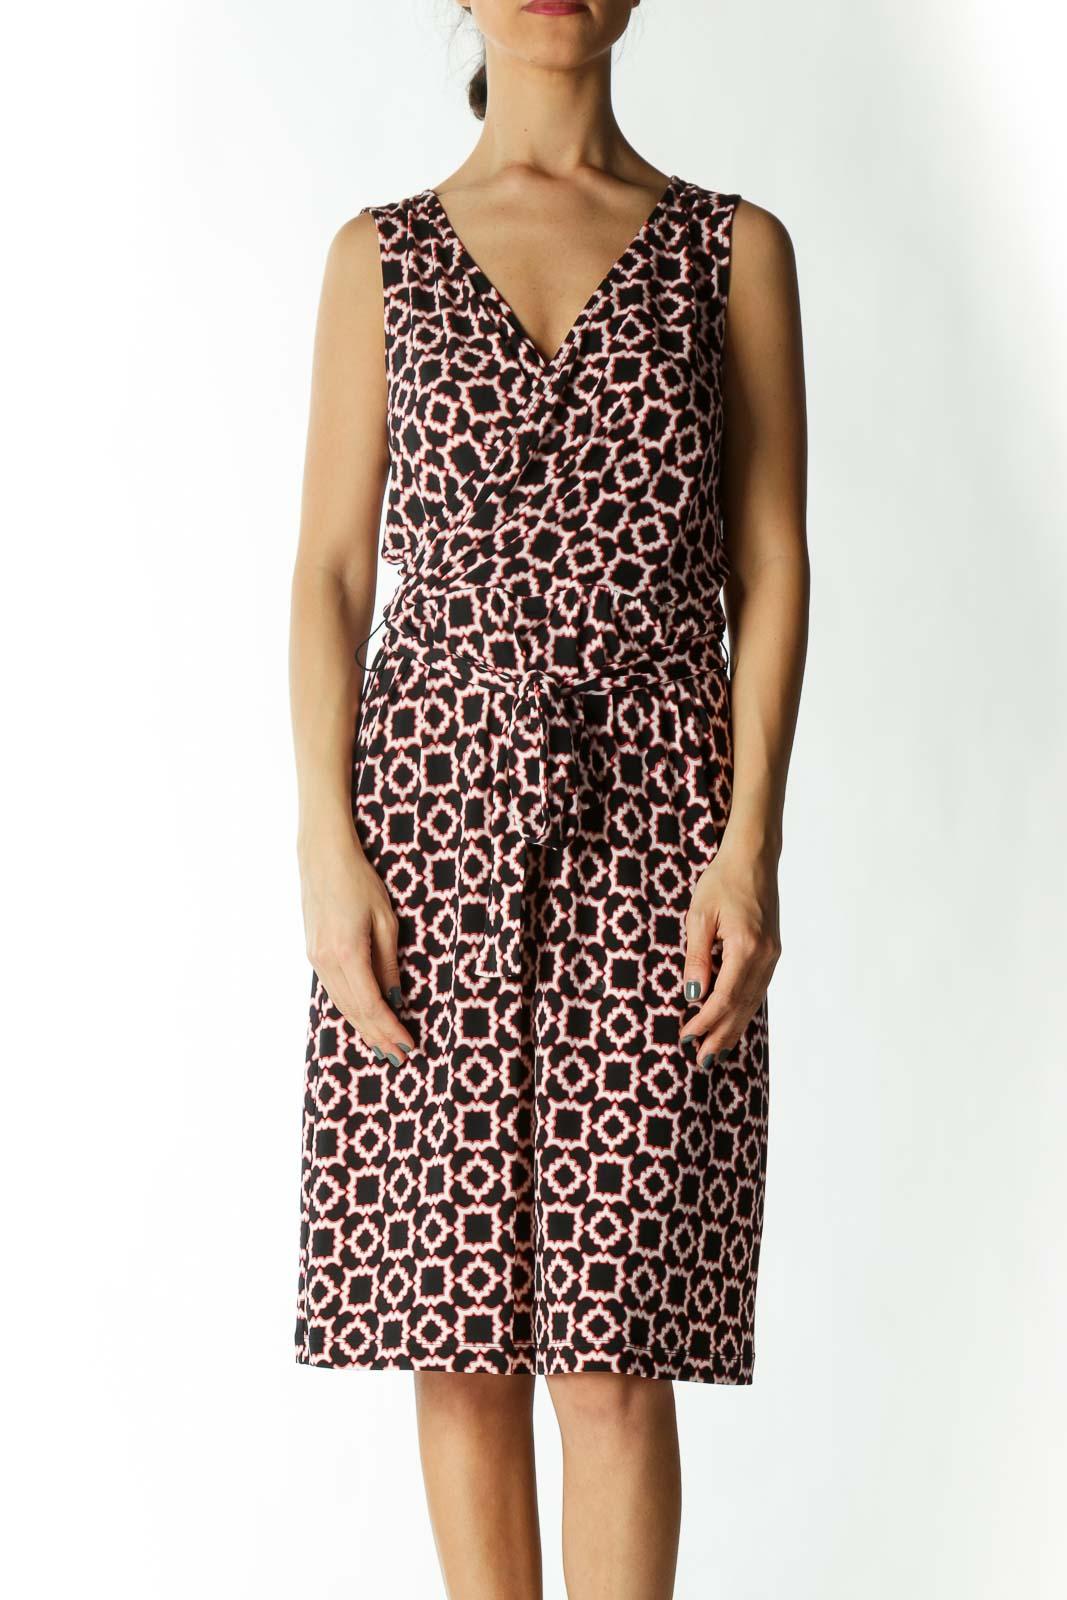 Black White & Red-Patterned Sleeveless Mock-Wrap Dress Front